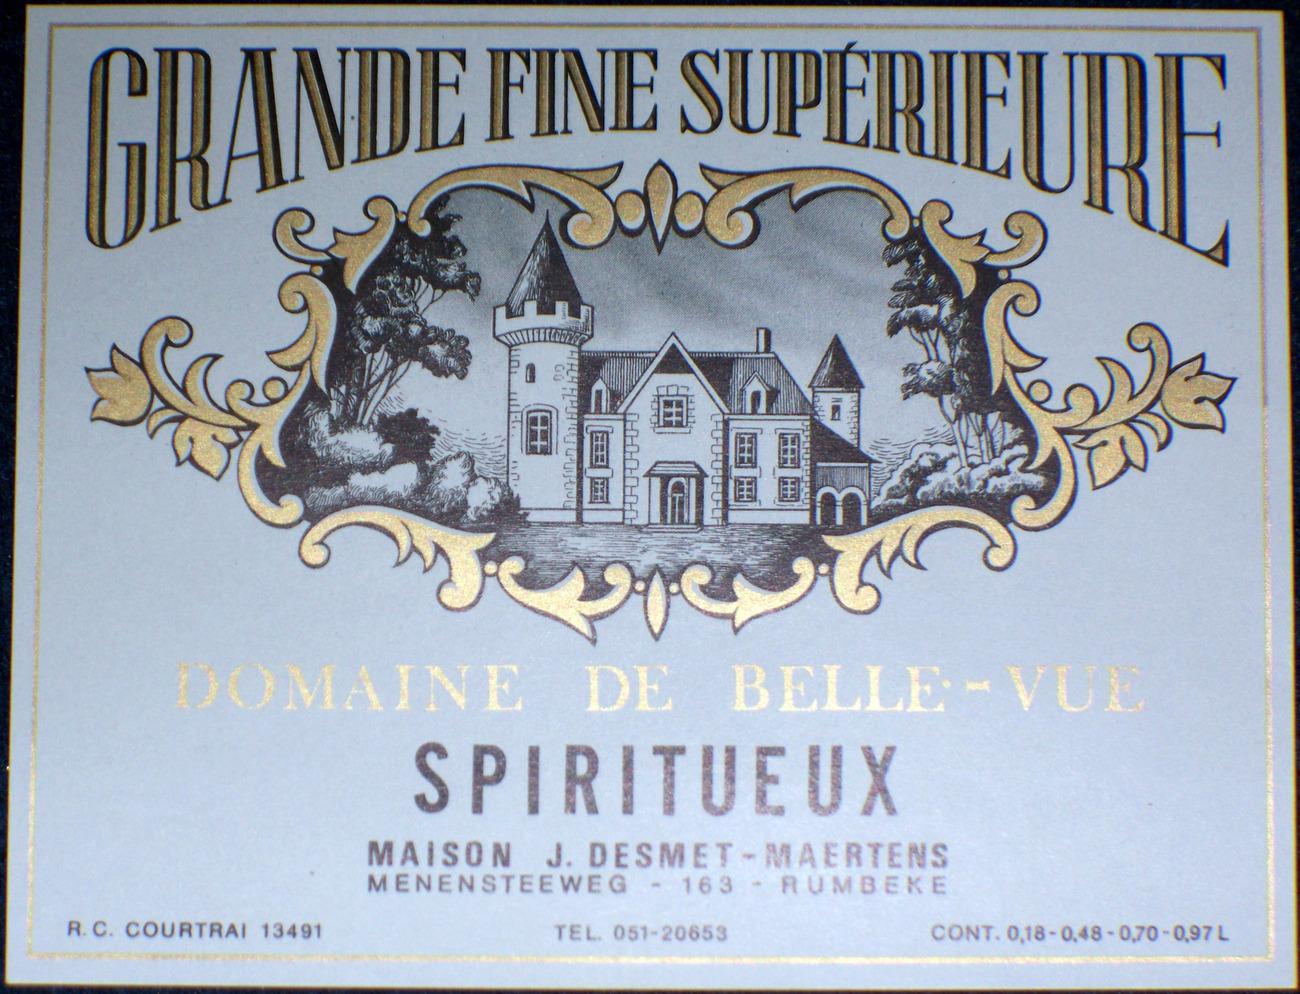 Nice!, Grande fine Superieure Spiritueux Label, 1930's